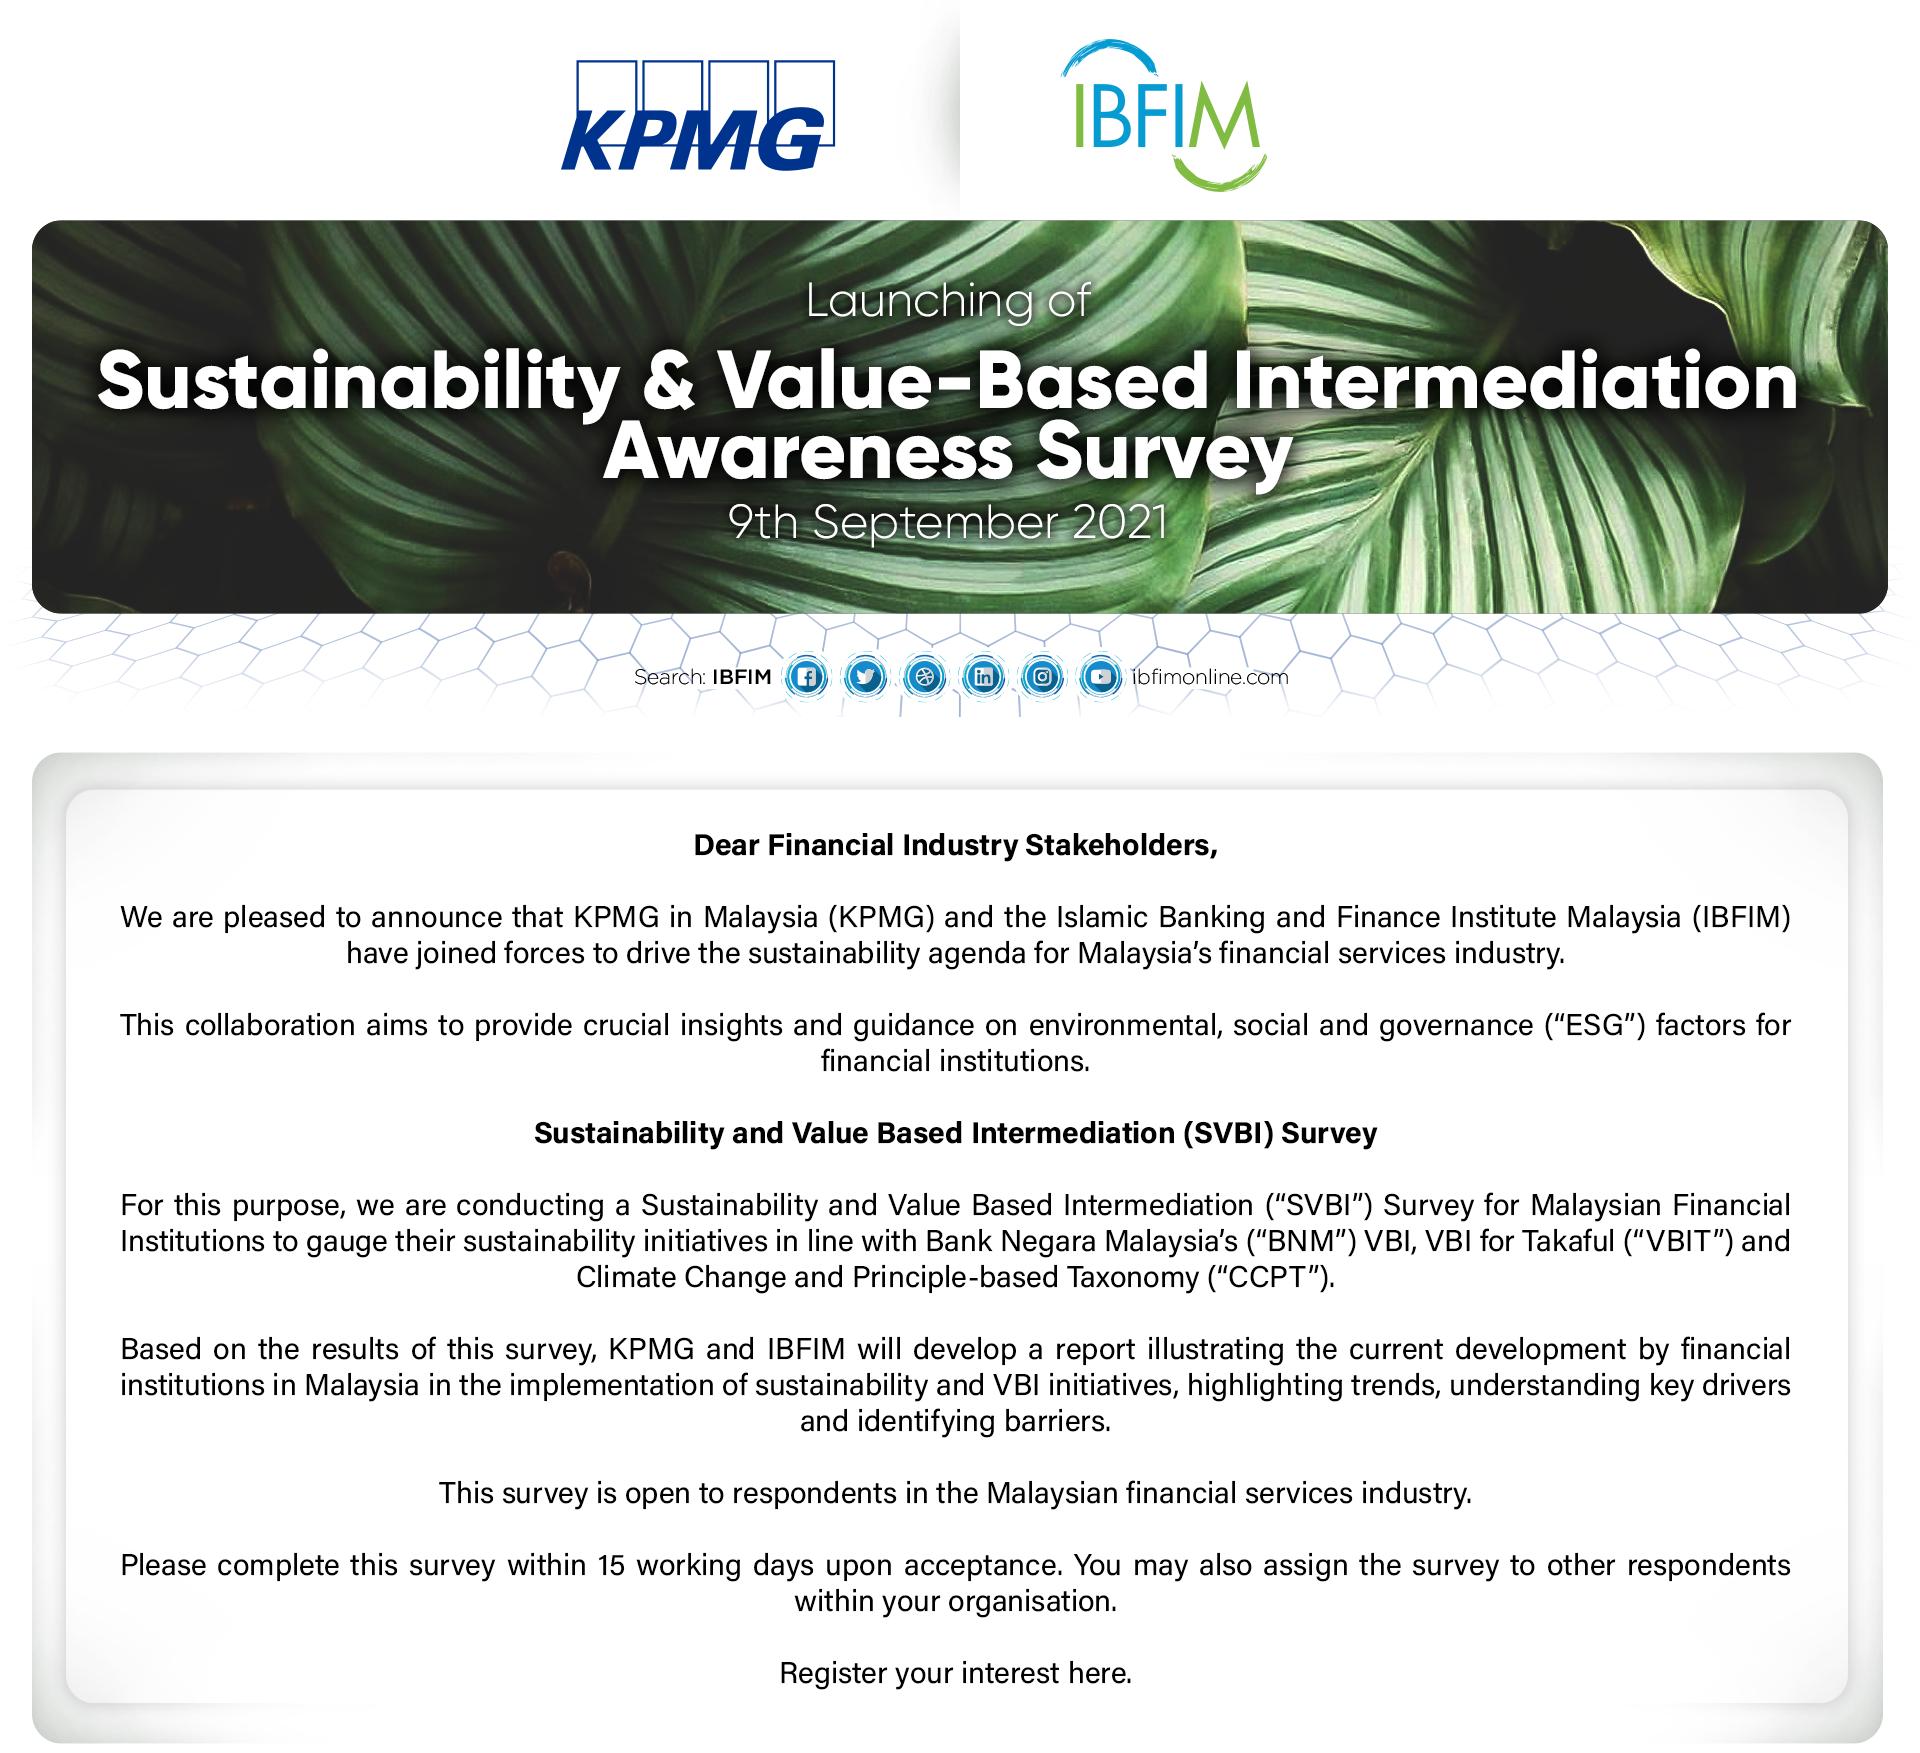 Email-Invite-KPMG-IBFIM (1)